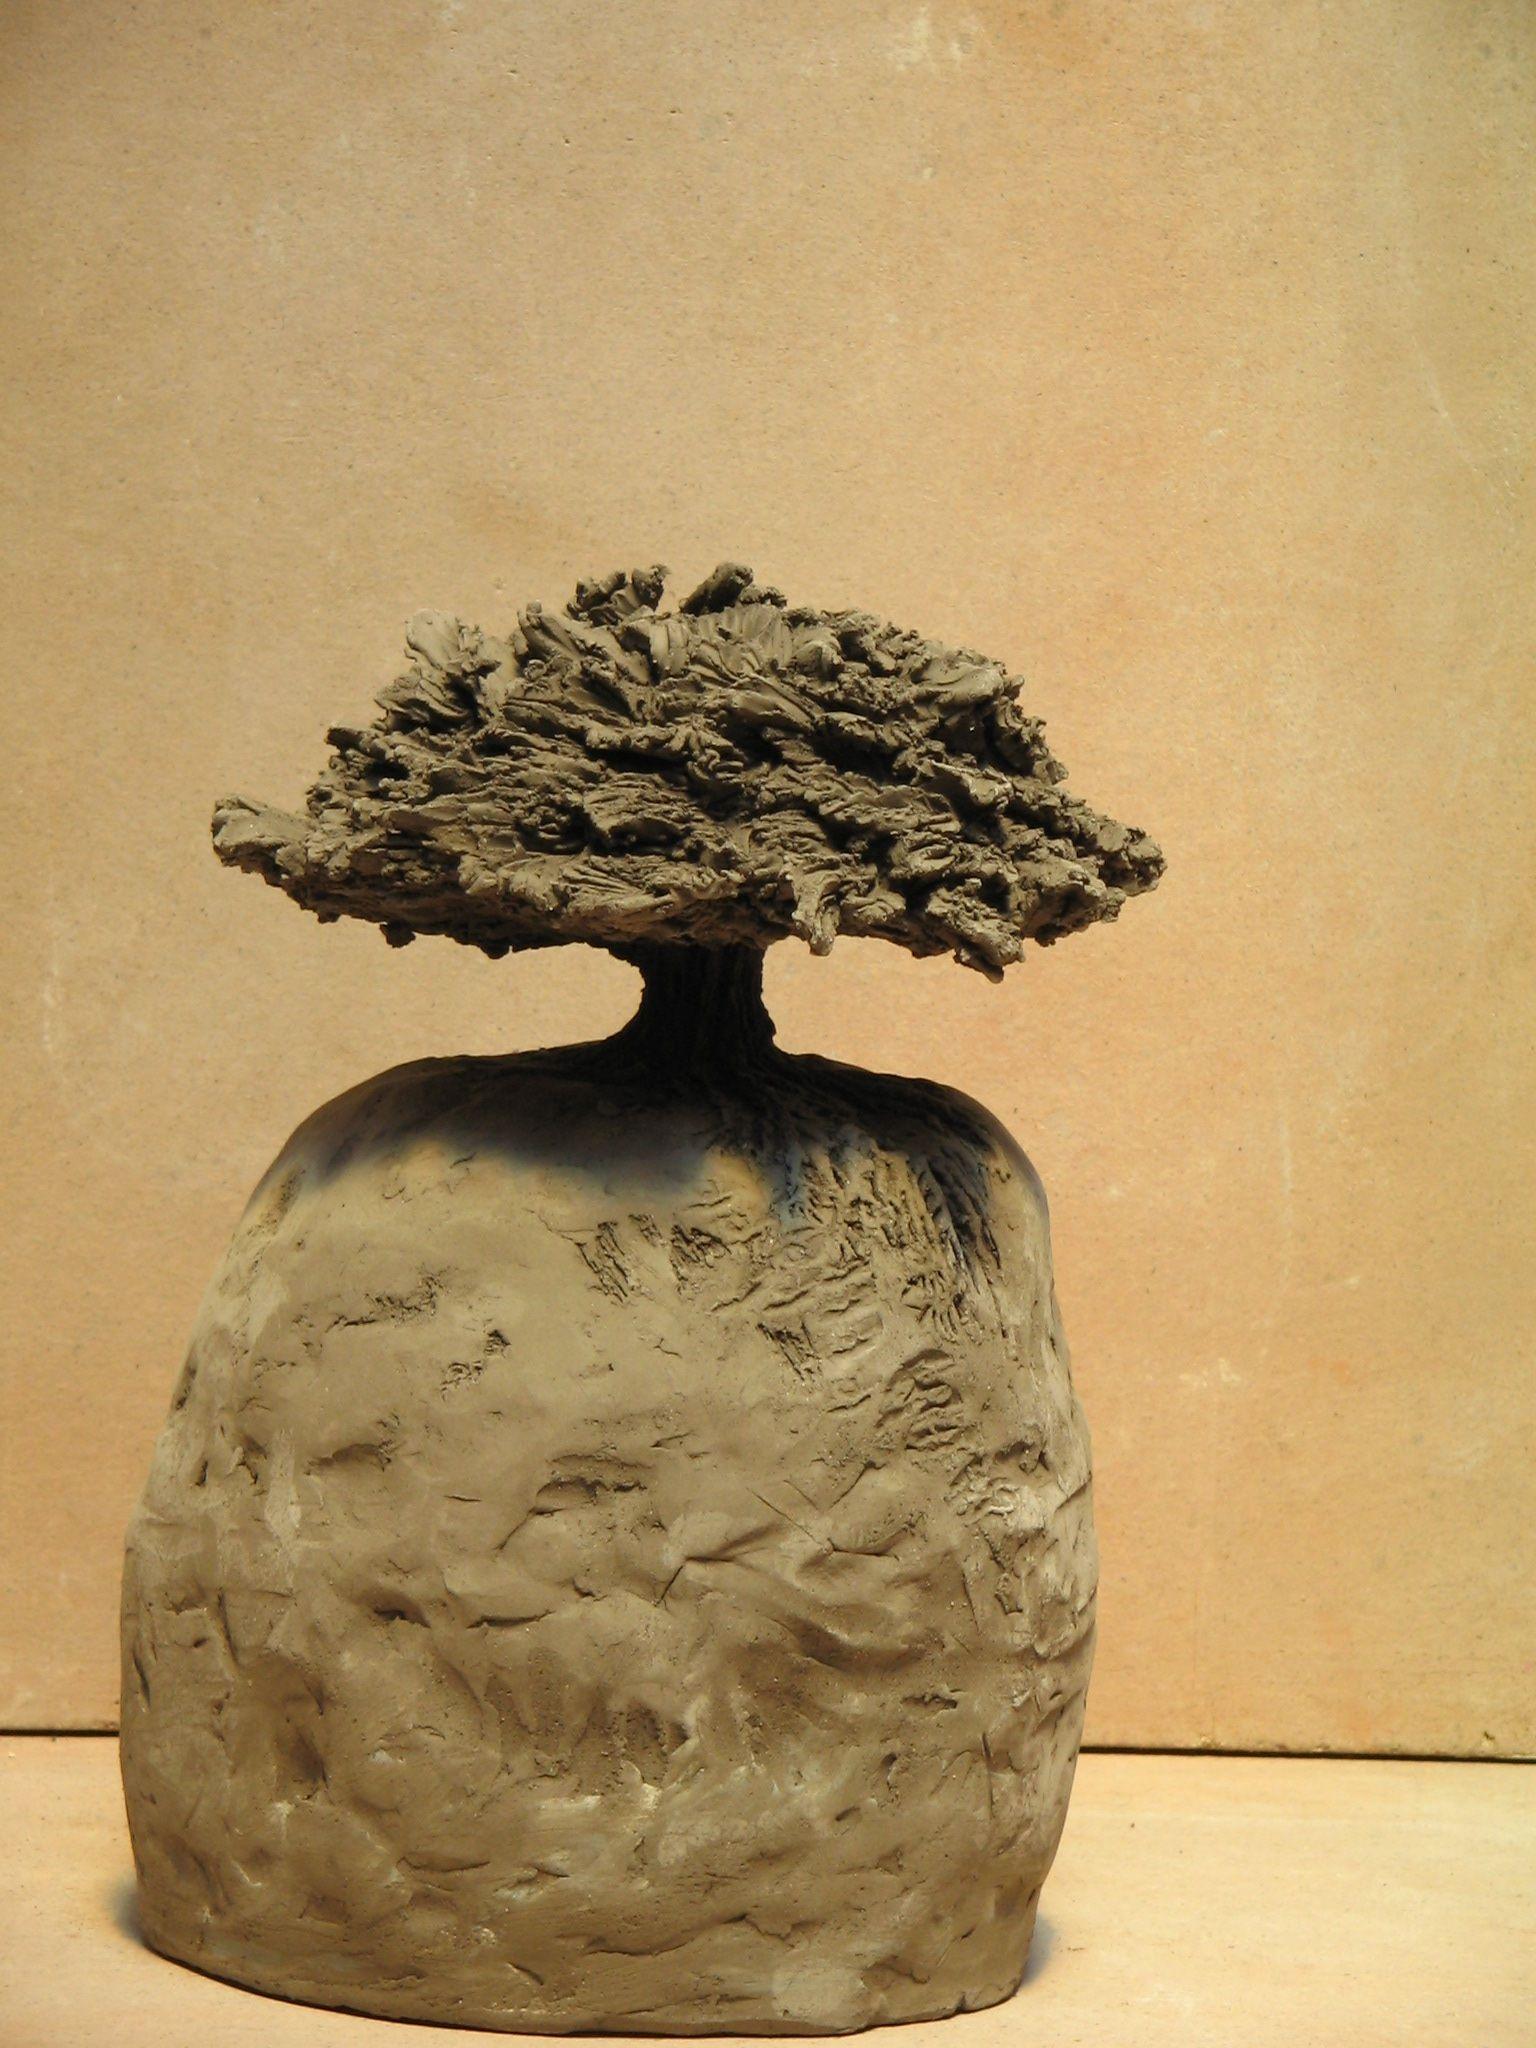 anne andr carron arbre sculpture en terre cuite sculpture et installation pinterest. Black Bedroom Furniture Sets. Home Design Ideas